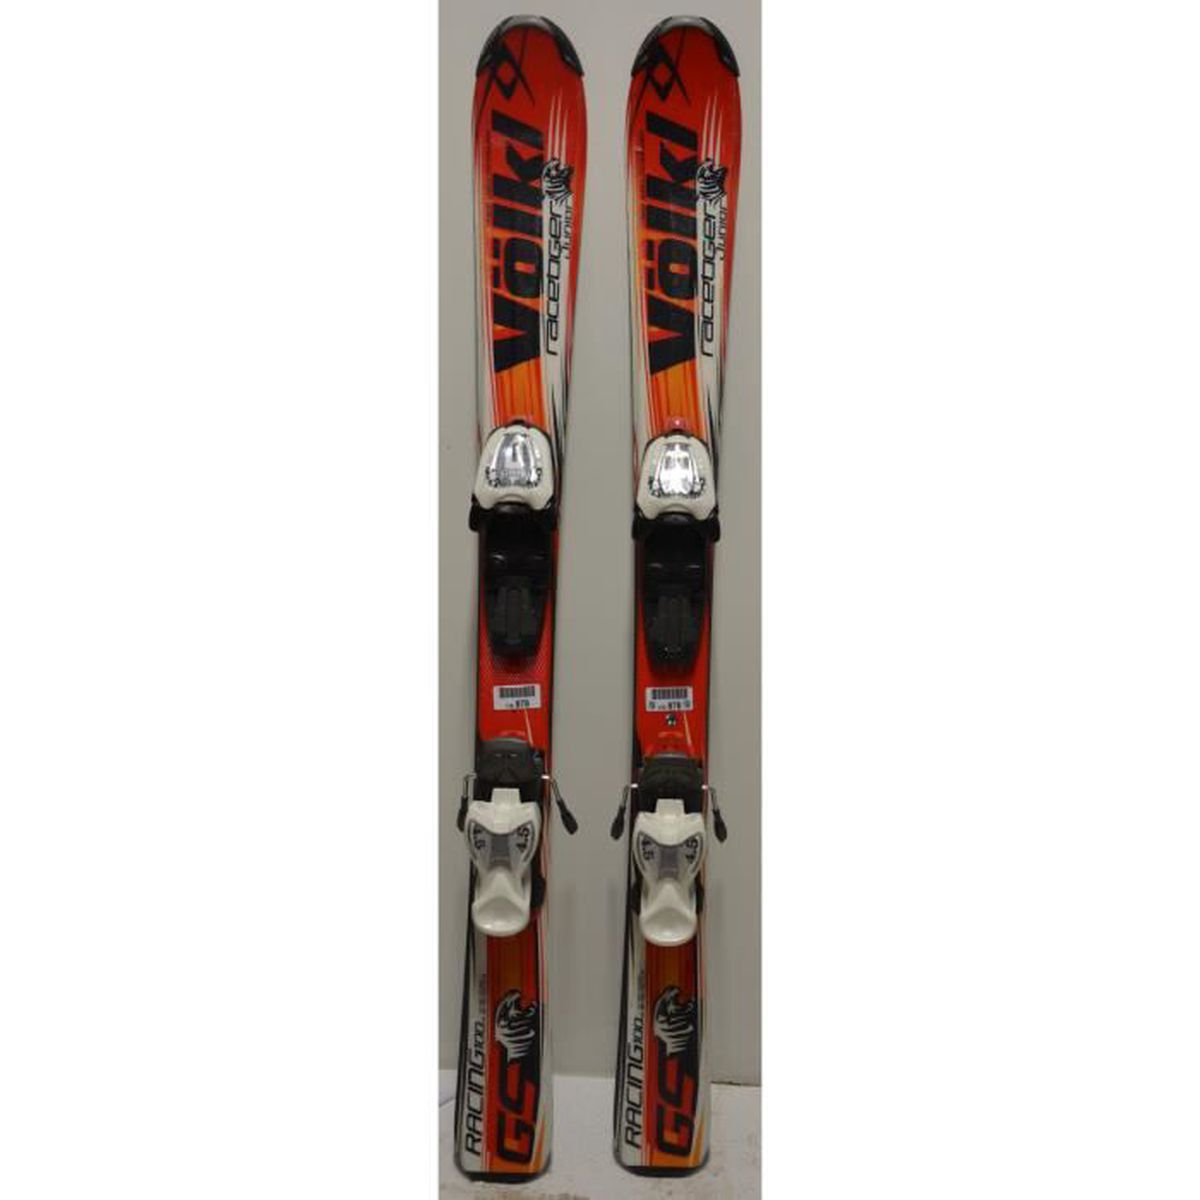 SKI Skis parabolique VOLKL Racetiger GS Junior 2010